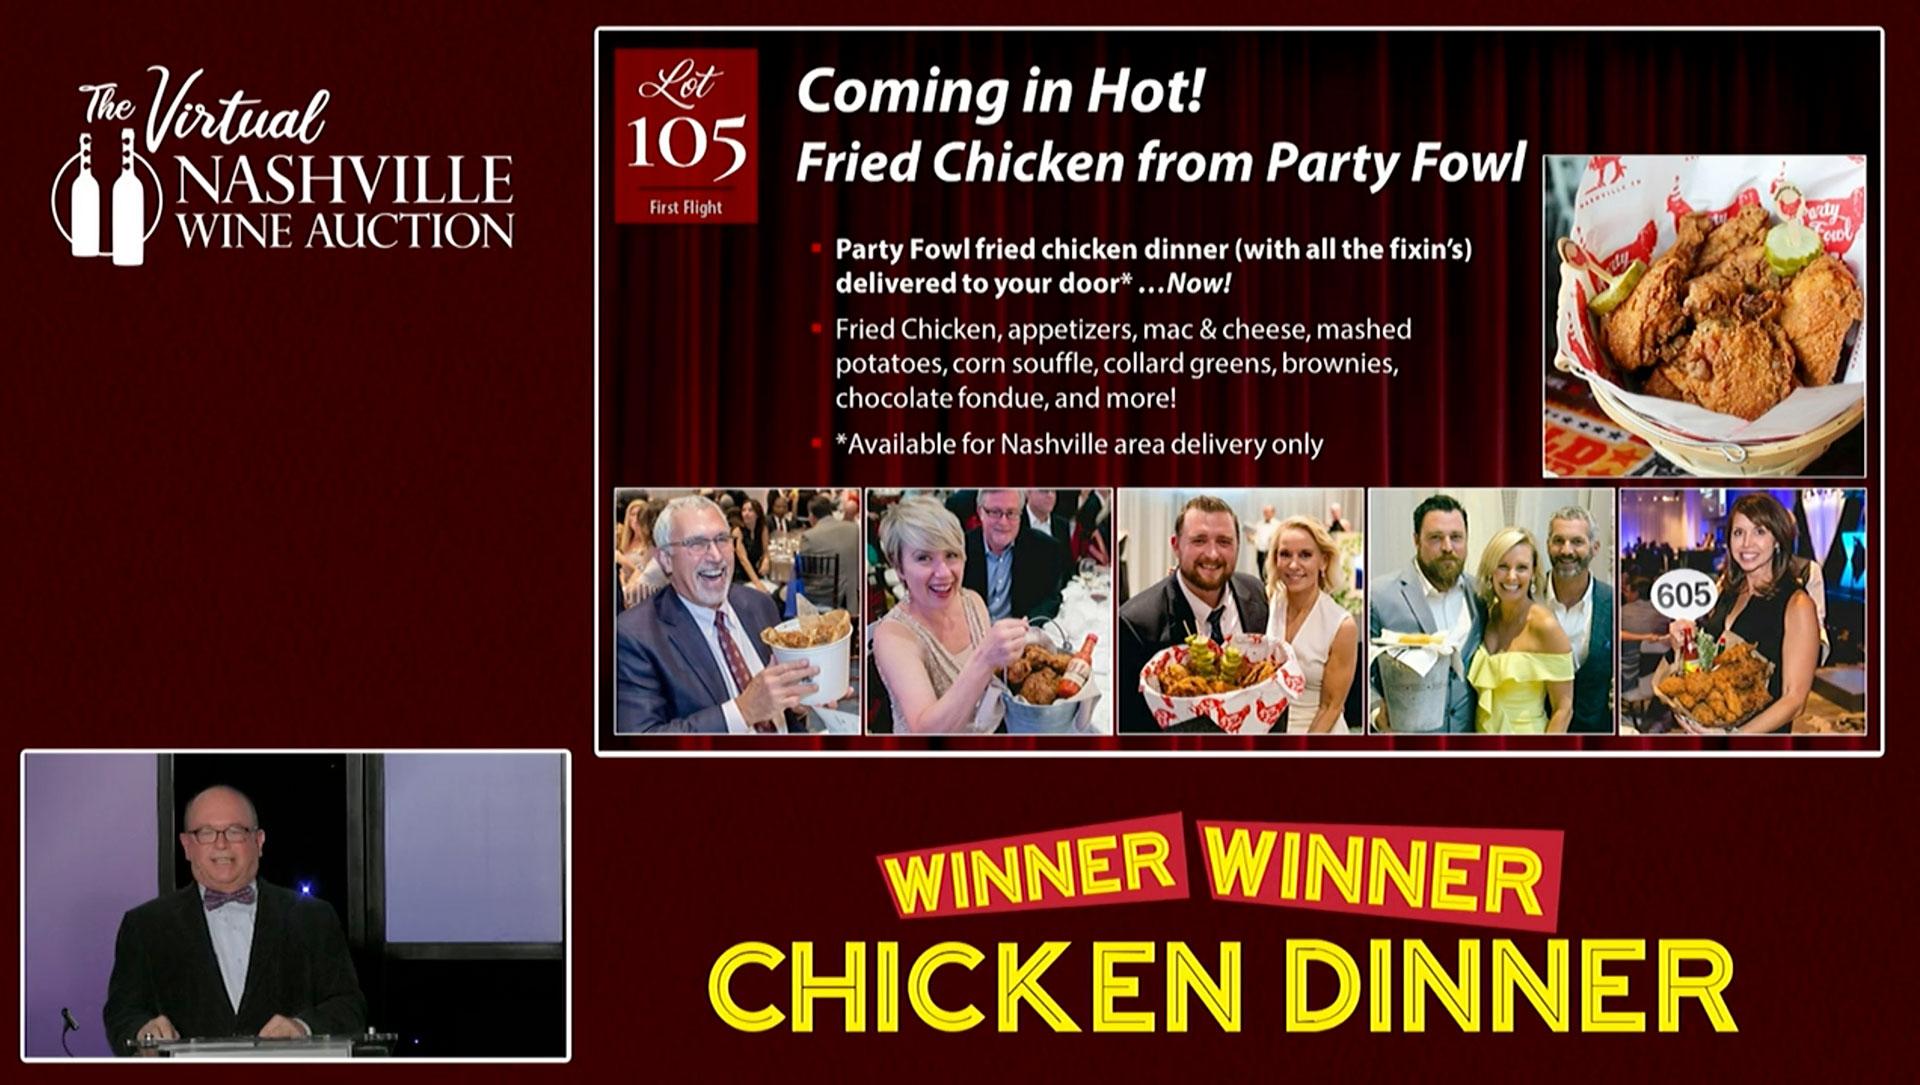 Wine-Auction-2020-Winner-Winner-Chicken-Dinner